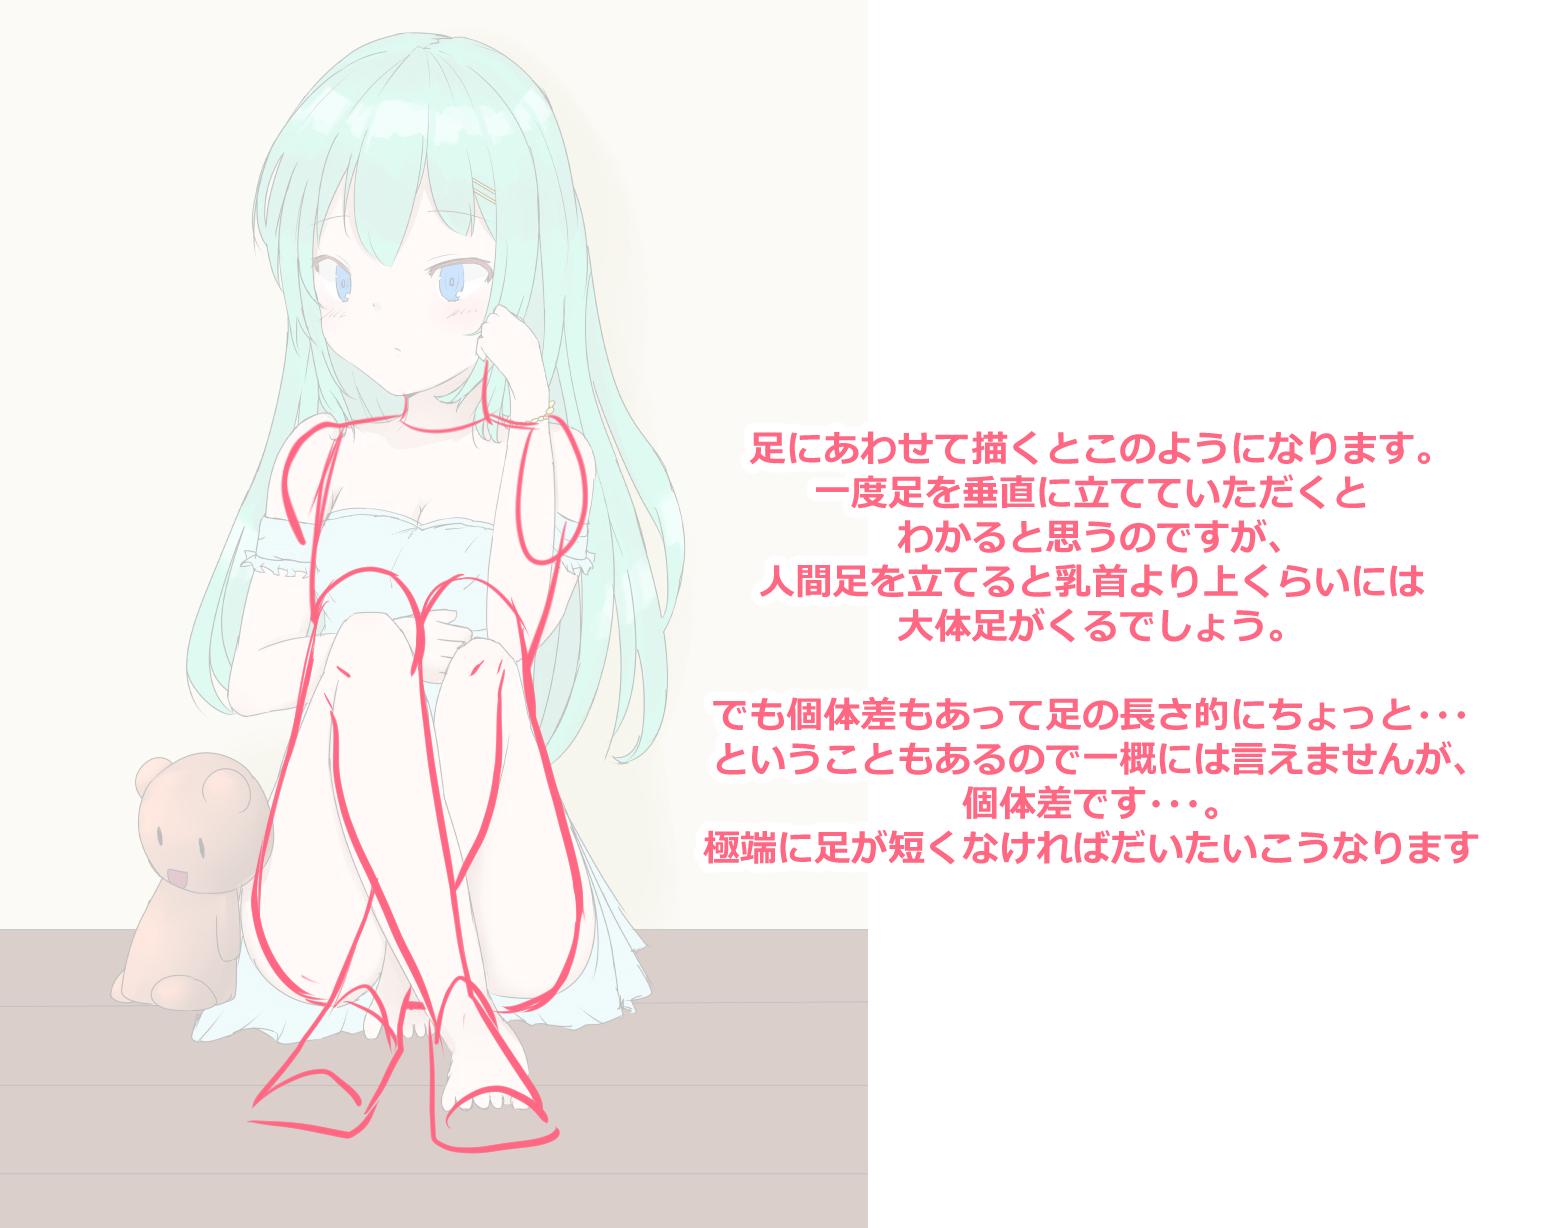 H2qkrzm8_2.jpg